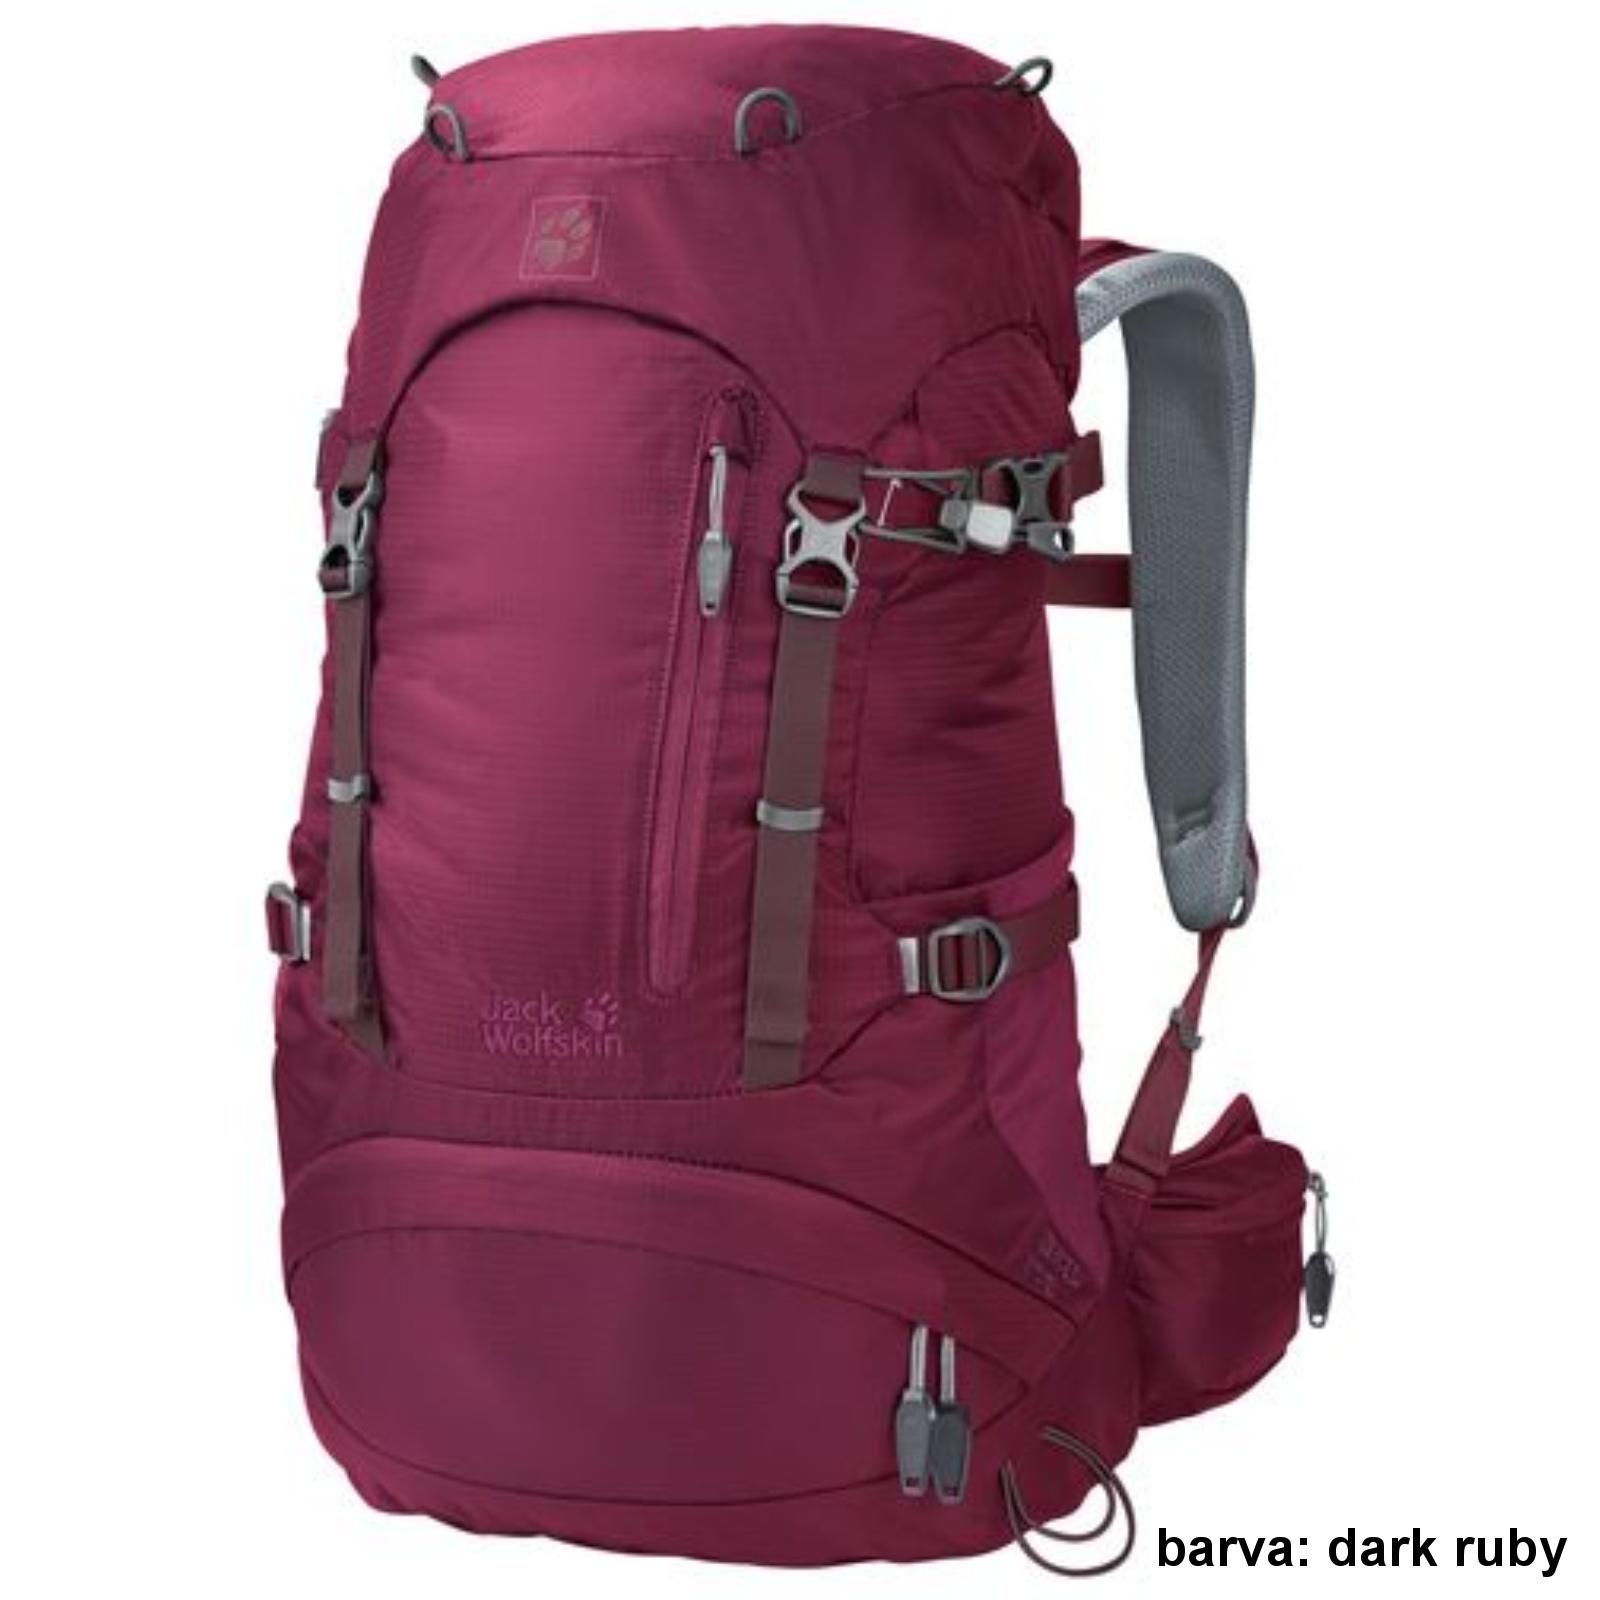 Batoh JACK WOLFSKIN ACS Hike Pack Women 24 l - dark ruby